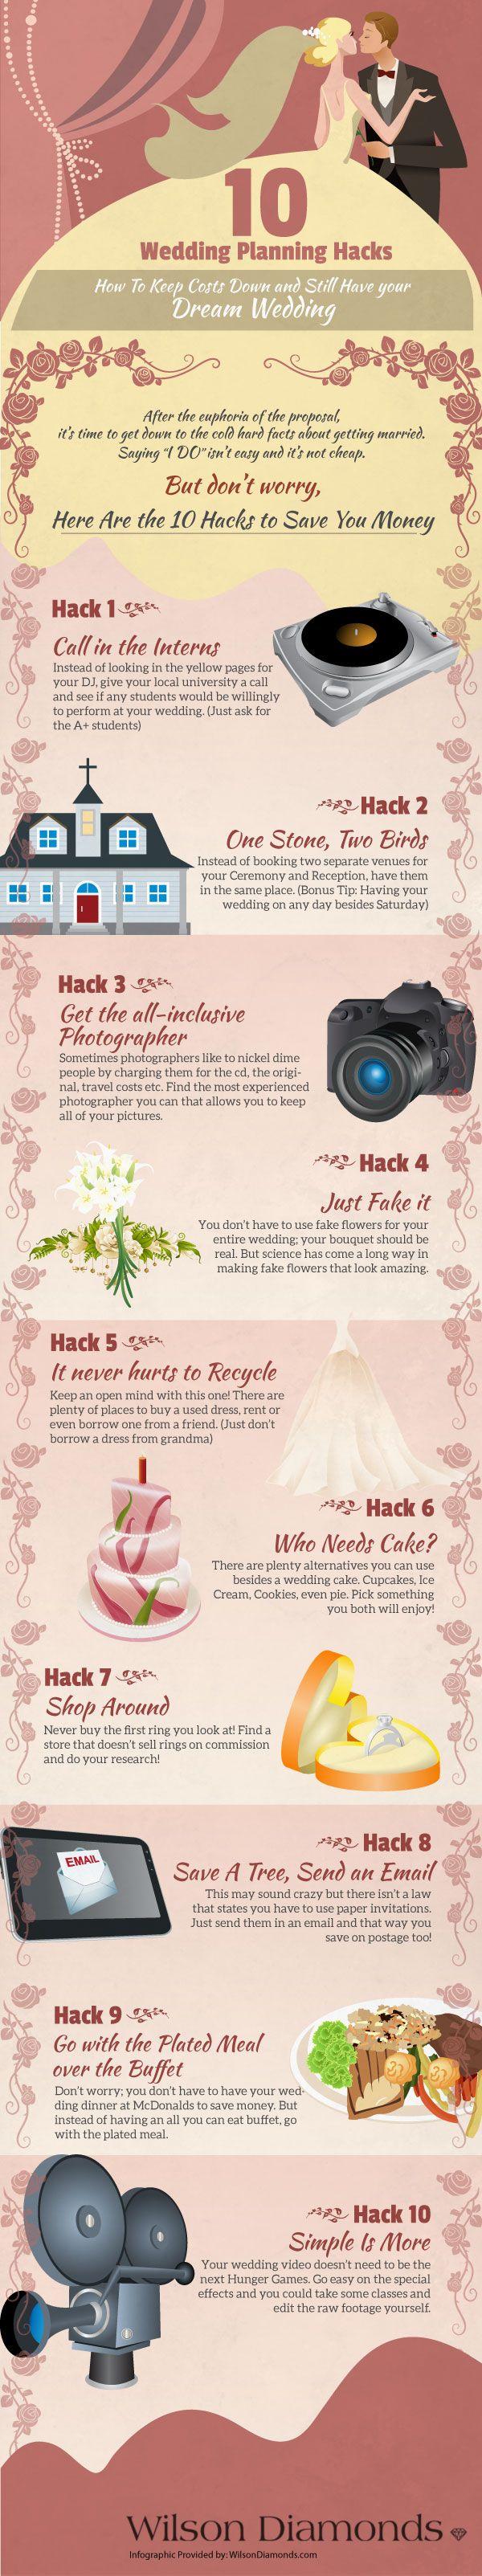 10 Wedding Planning Hacks  #Infographic #Wedding